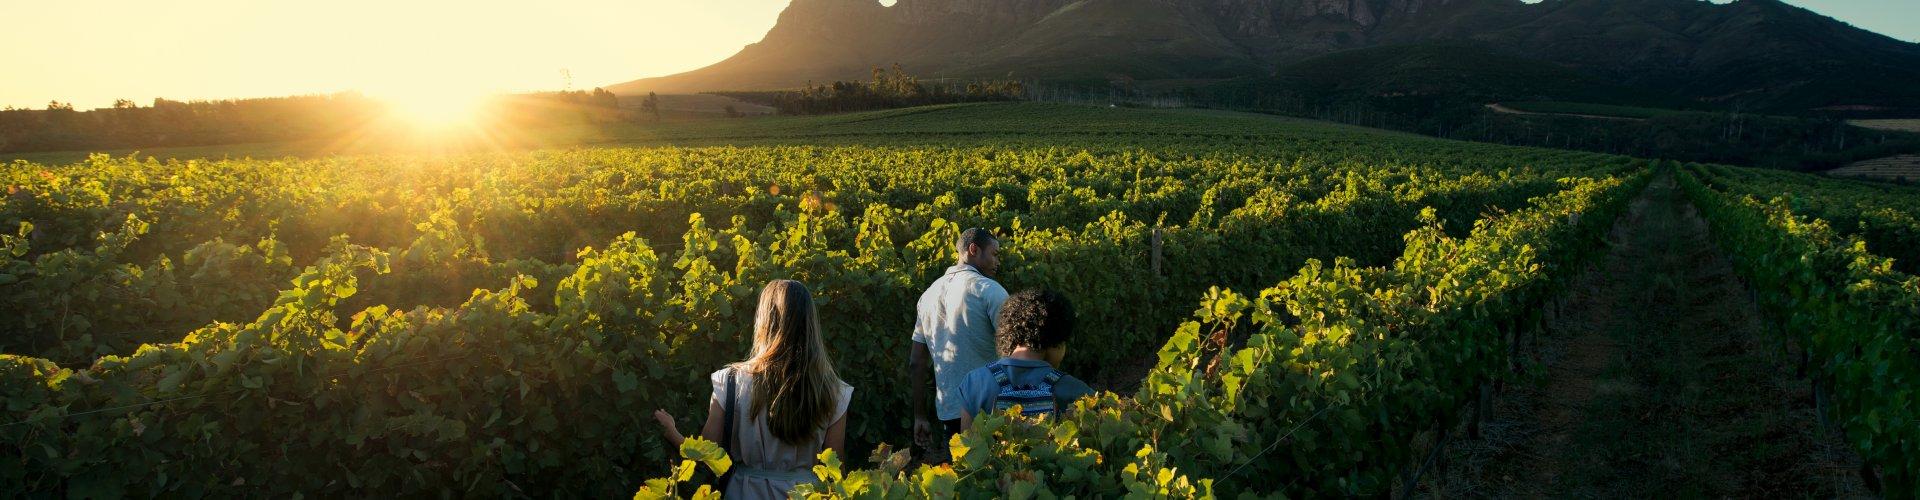 Wijnautoreis Zuid-Afrika